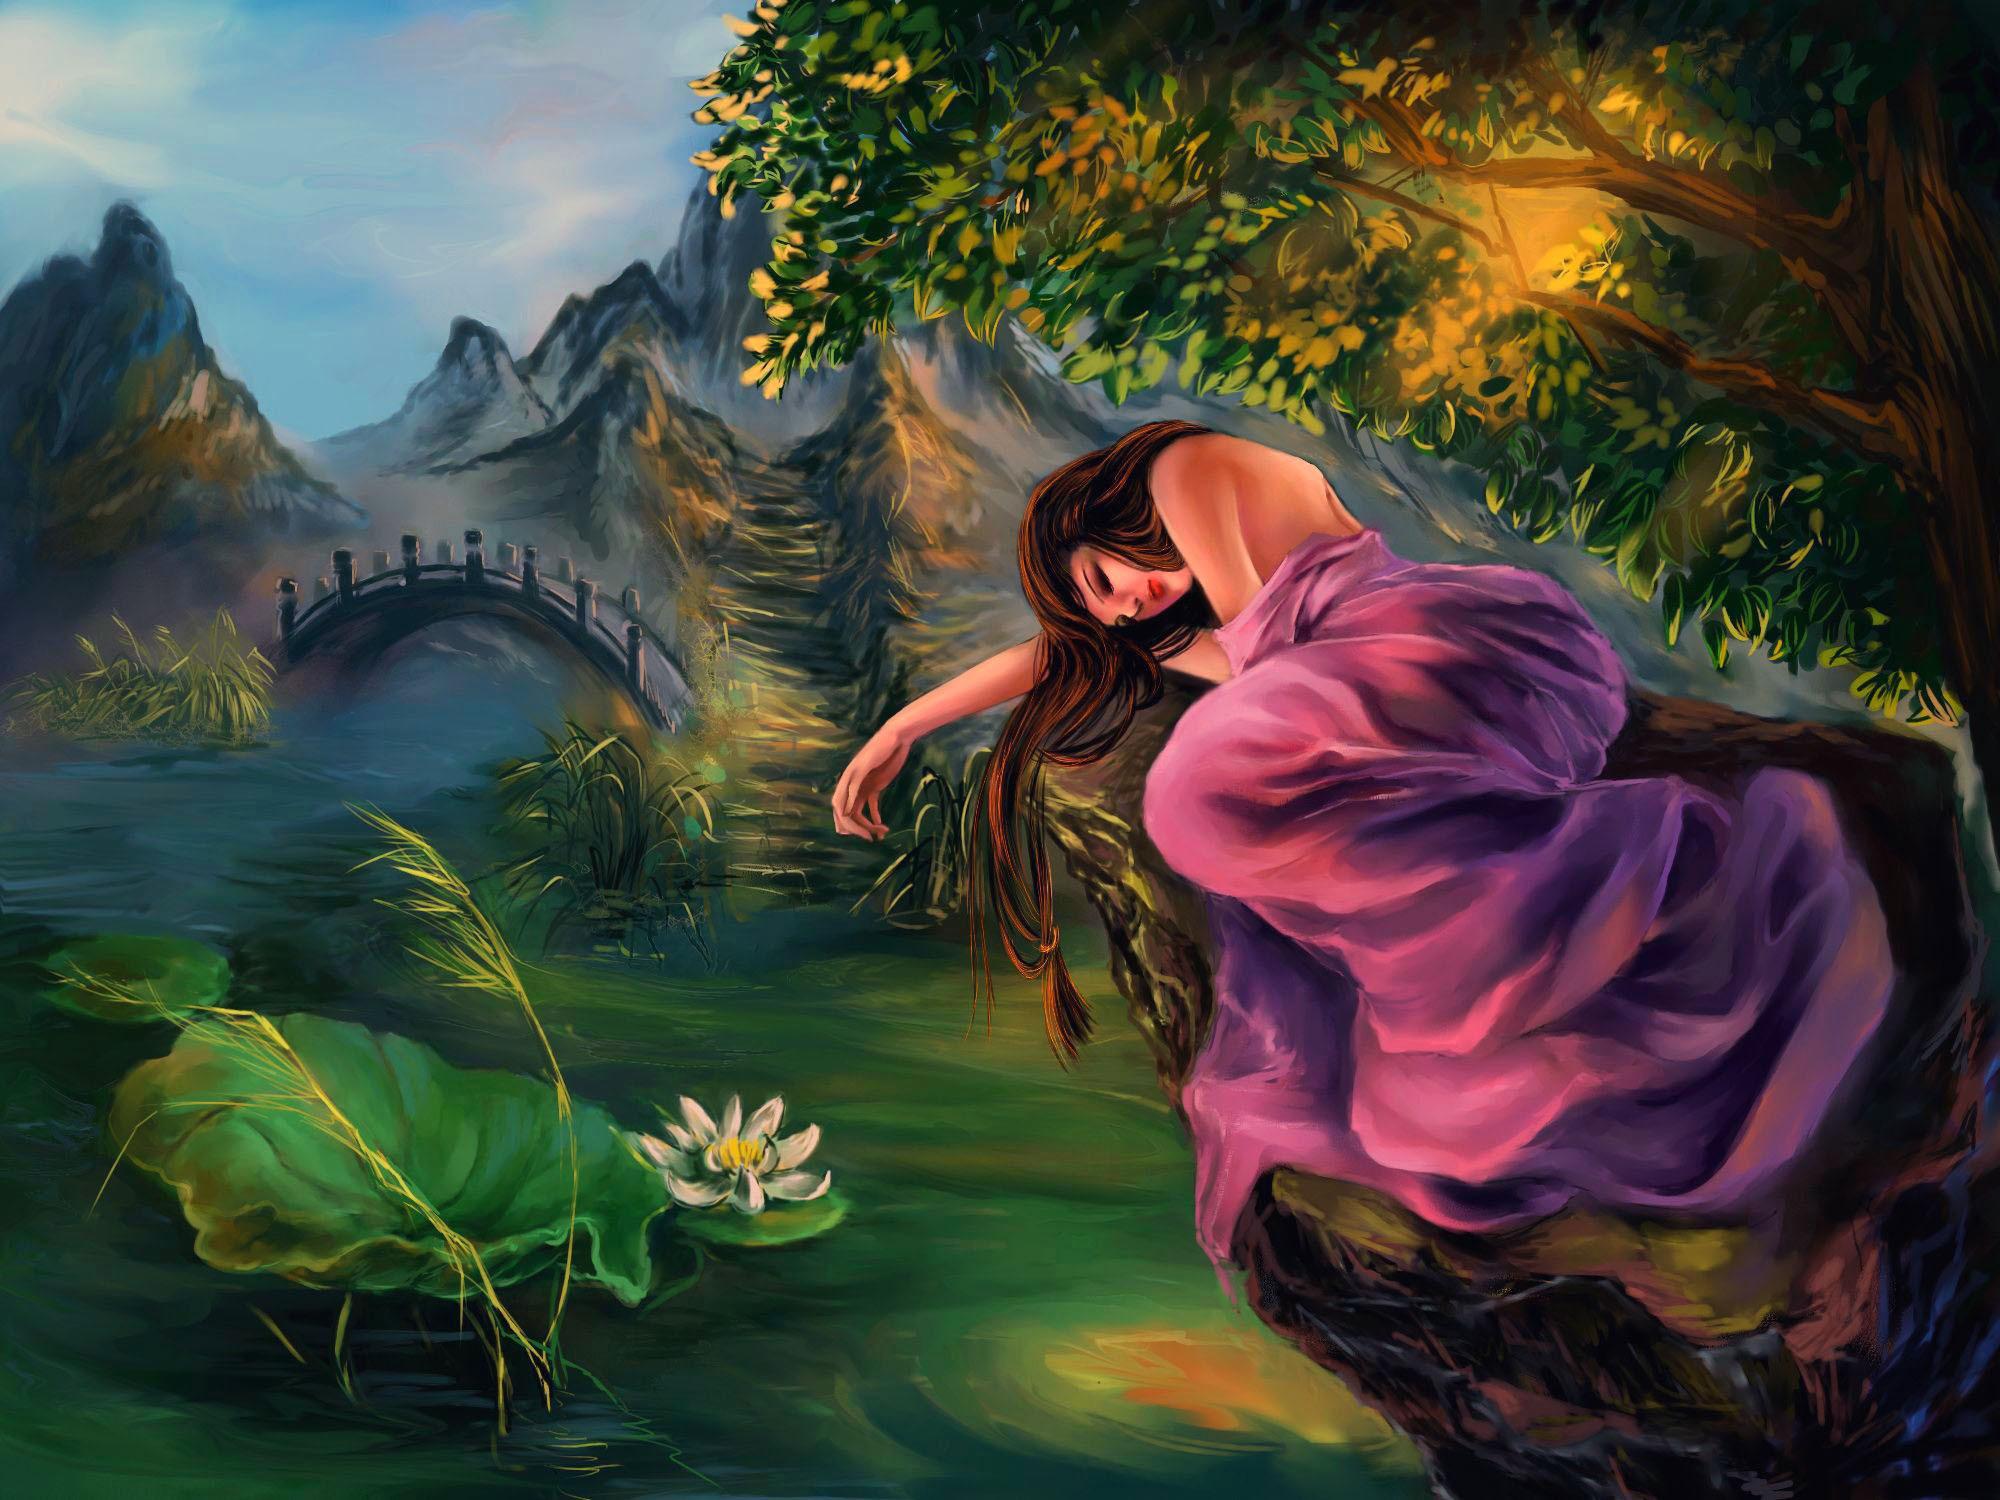 Картинка девочка фэнтези